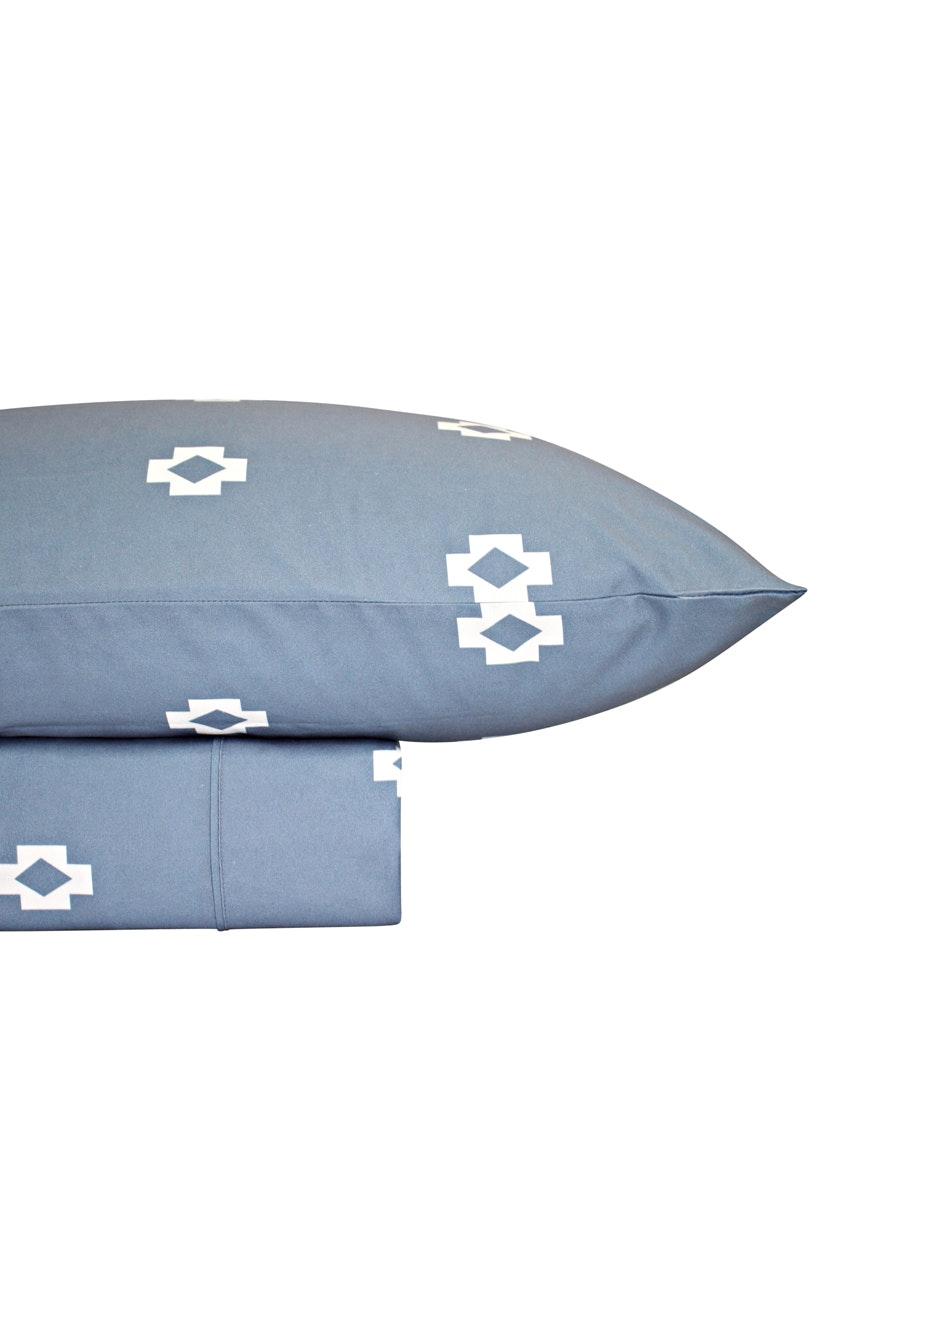 Thermal Flannel Sheet Sets - Tribal Design - Bay Blue - Single Bed